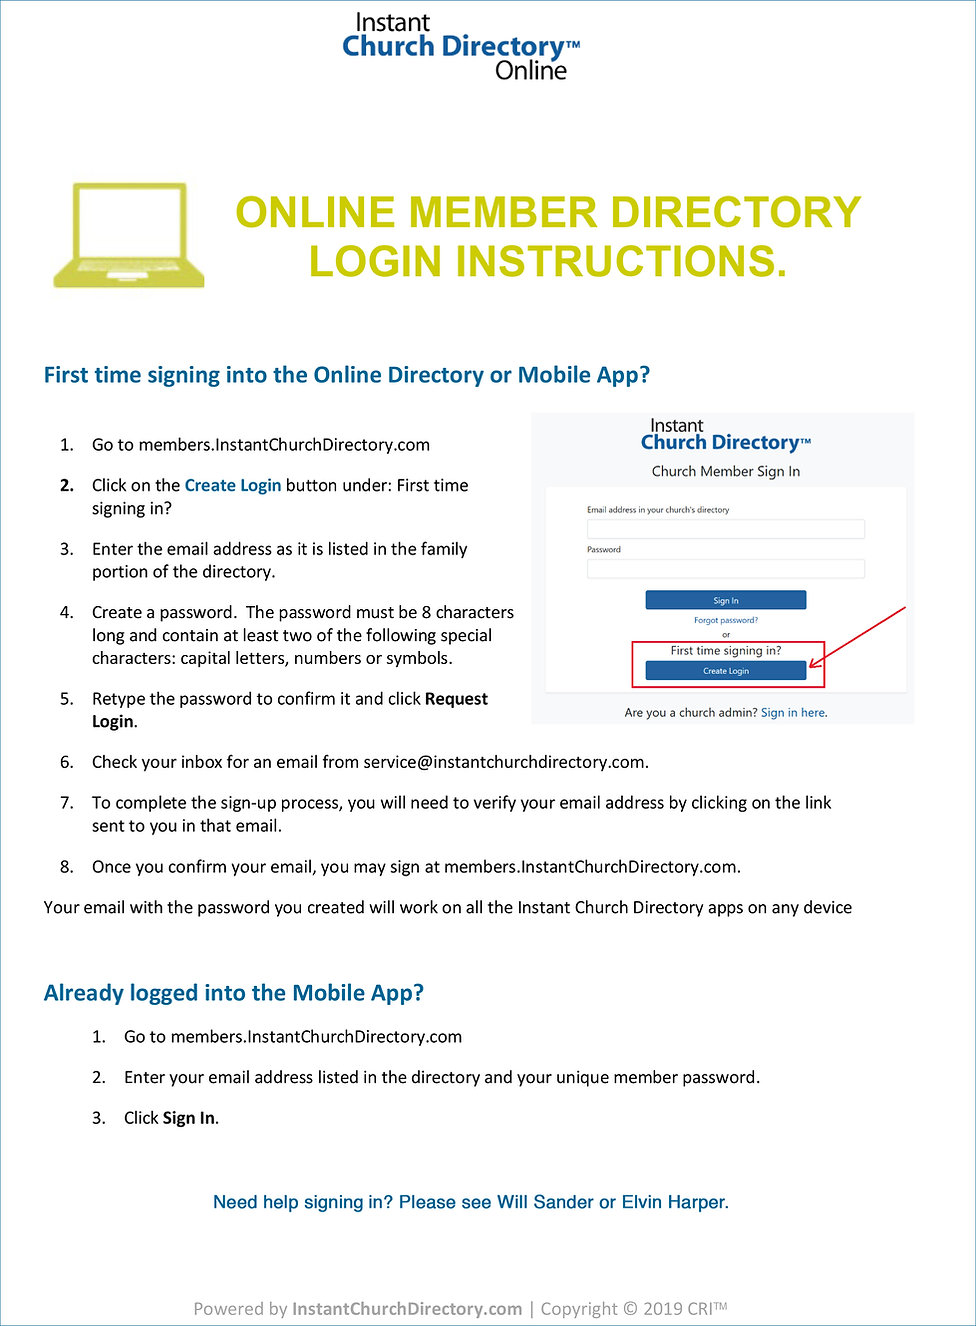 Member-Login-OnlineMemberDirectory-Instr